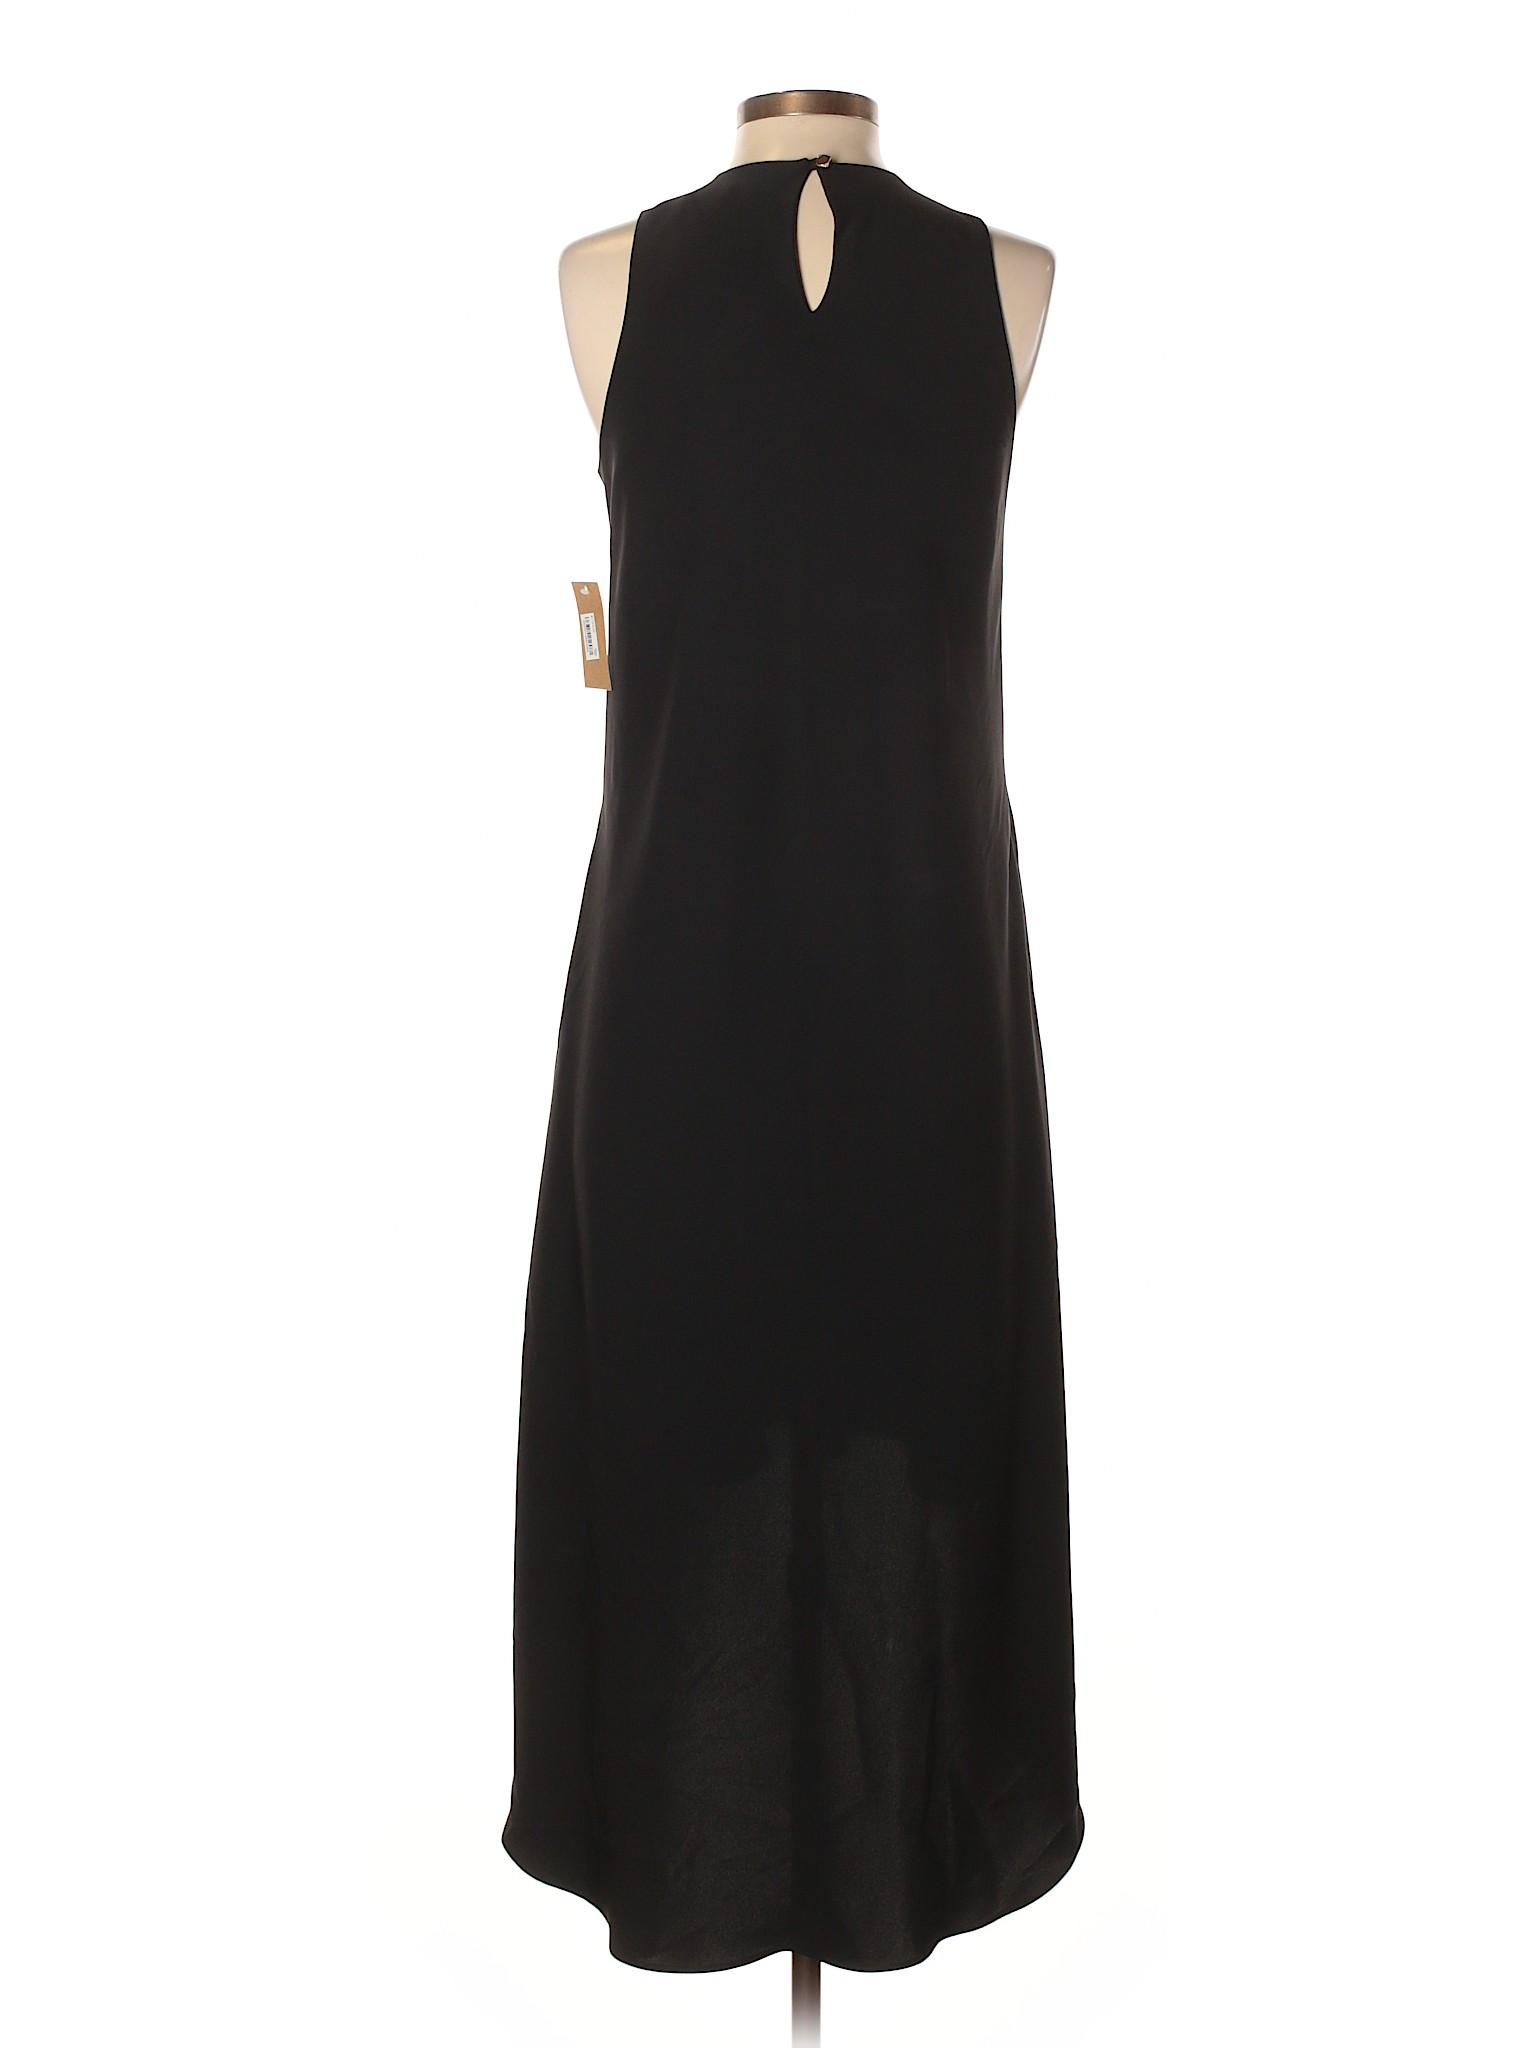 Dress Roy Casual Rachel RACHEL Selling WOPqITE